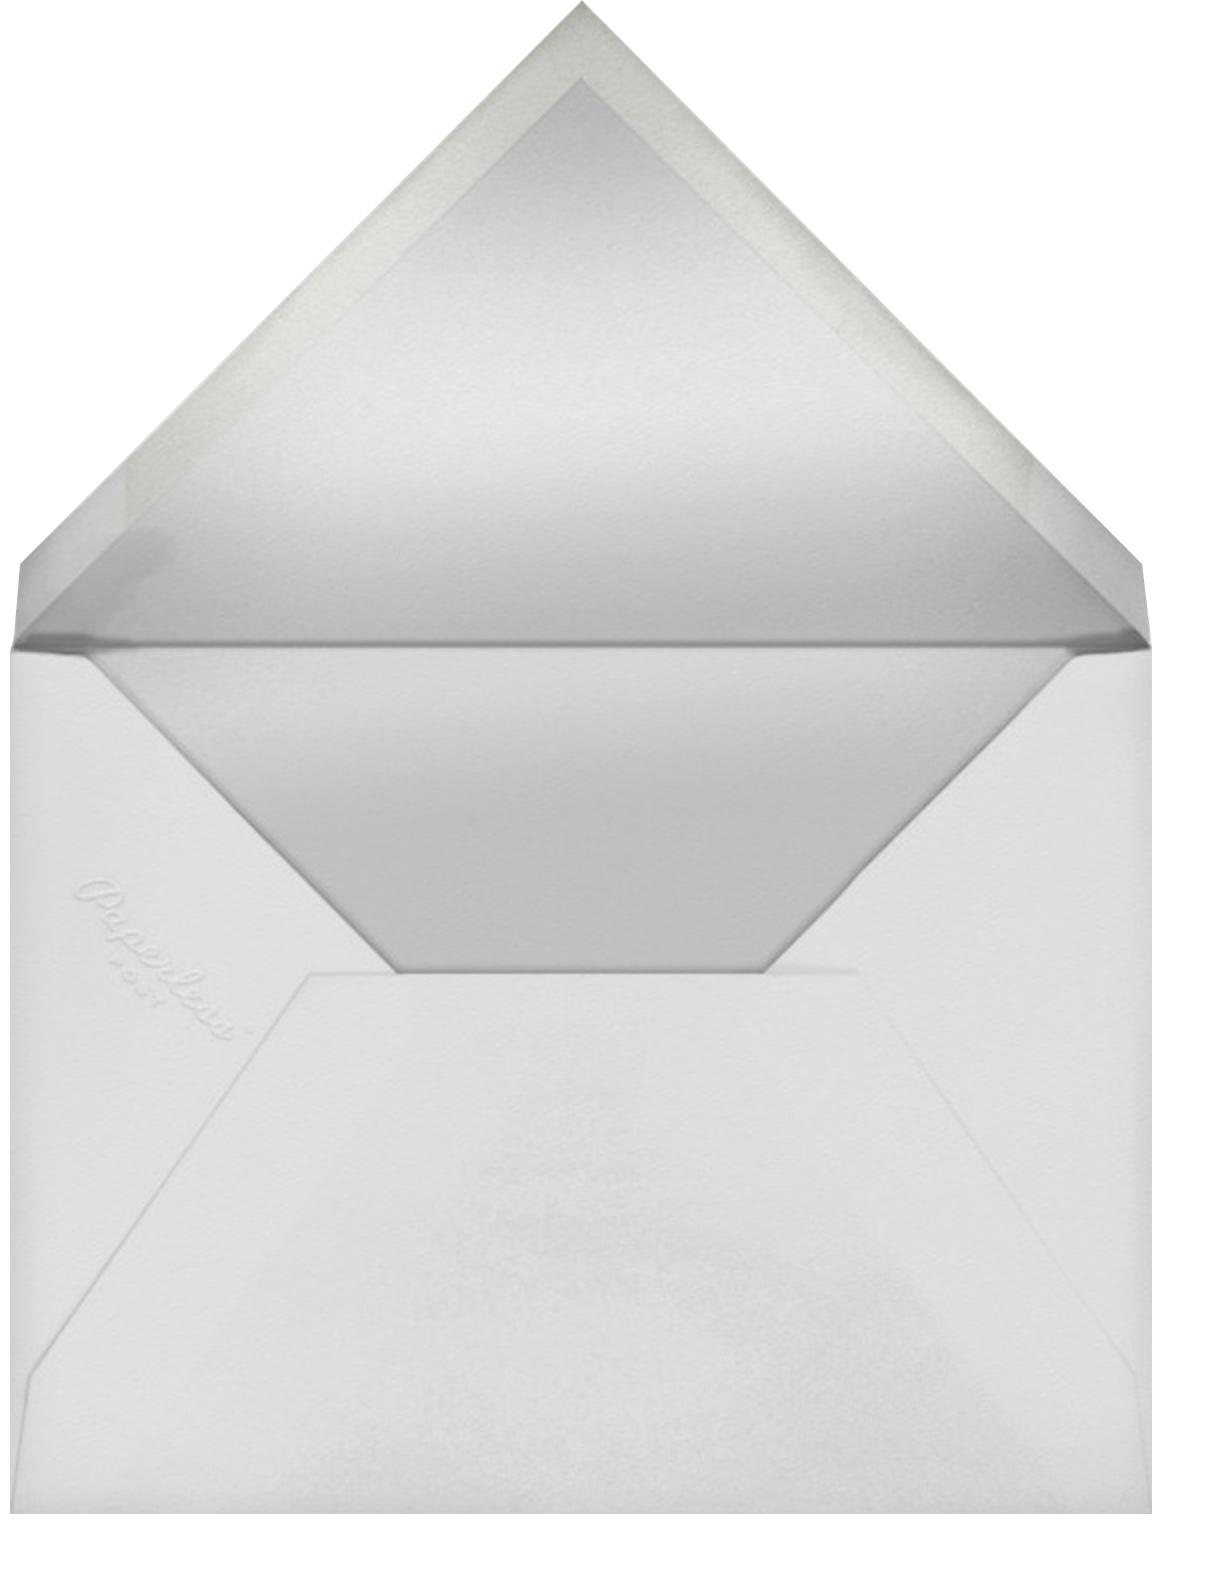 Marylebone Nursery - Newport Blue - Paperless Post - Baby shower - envelope back